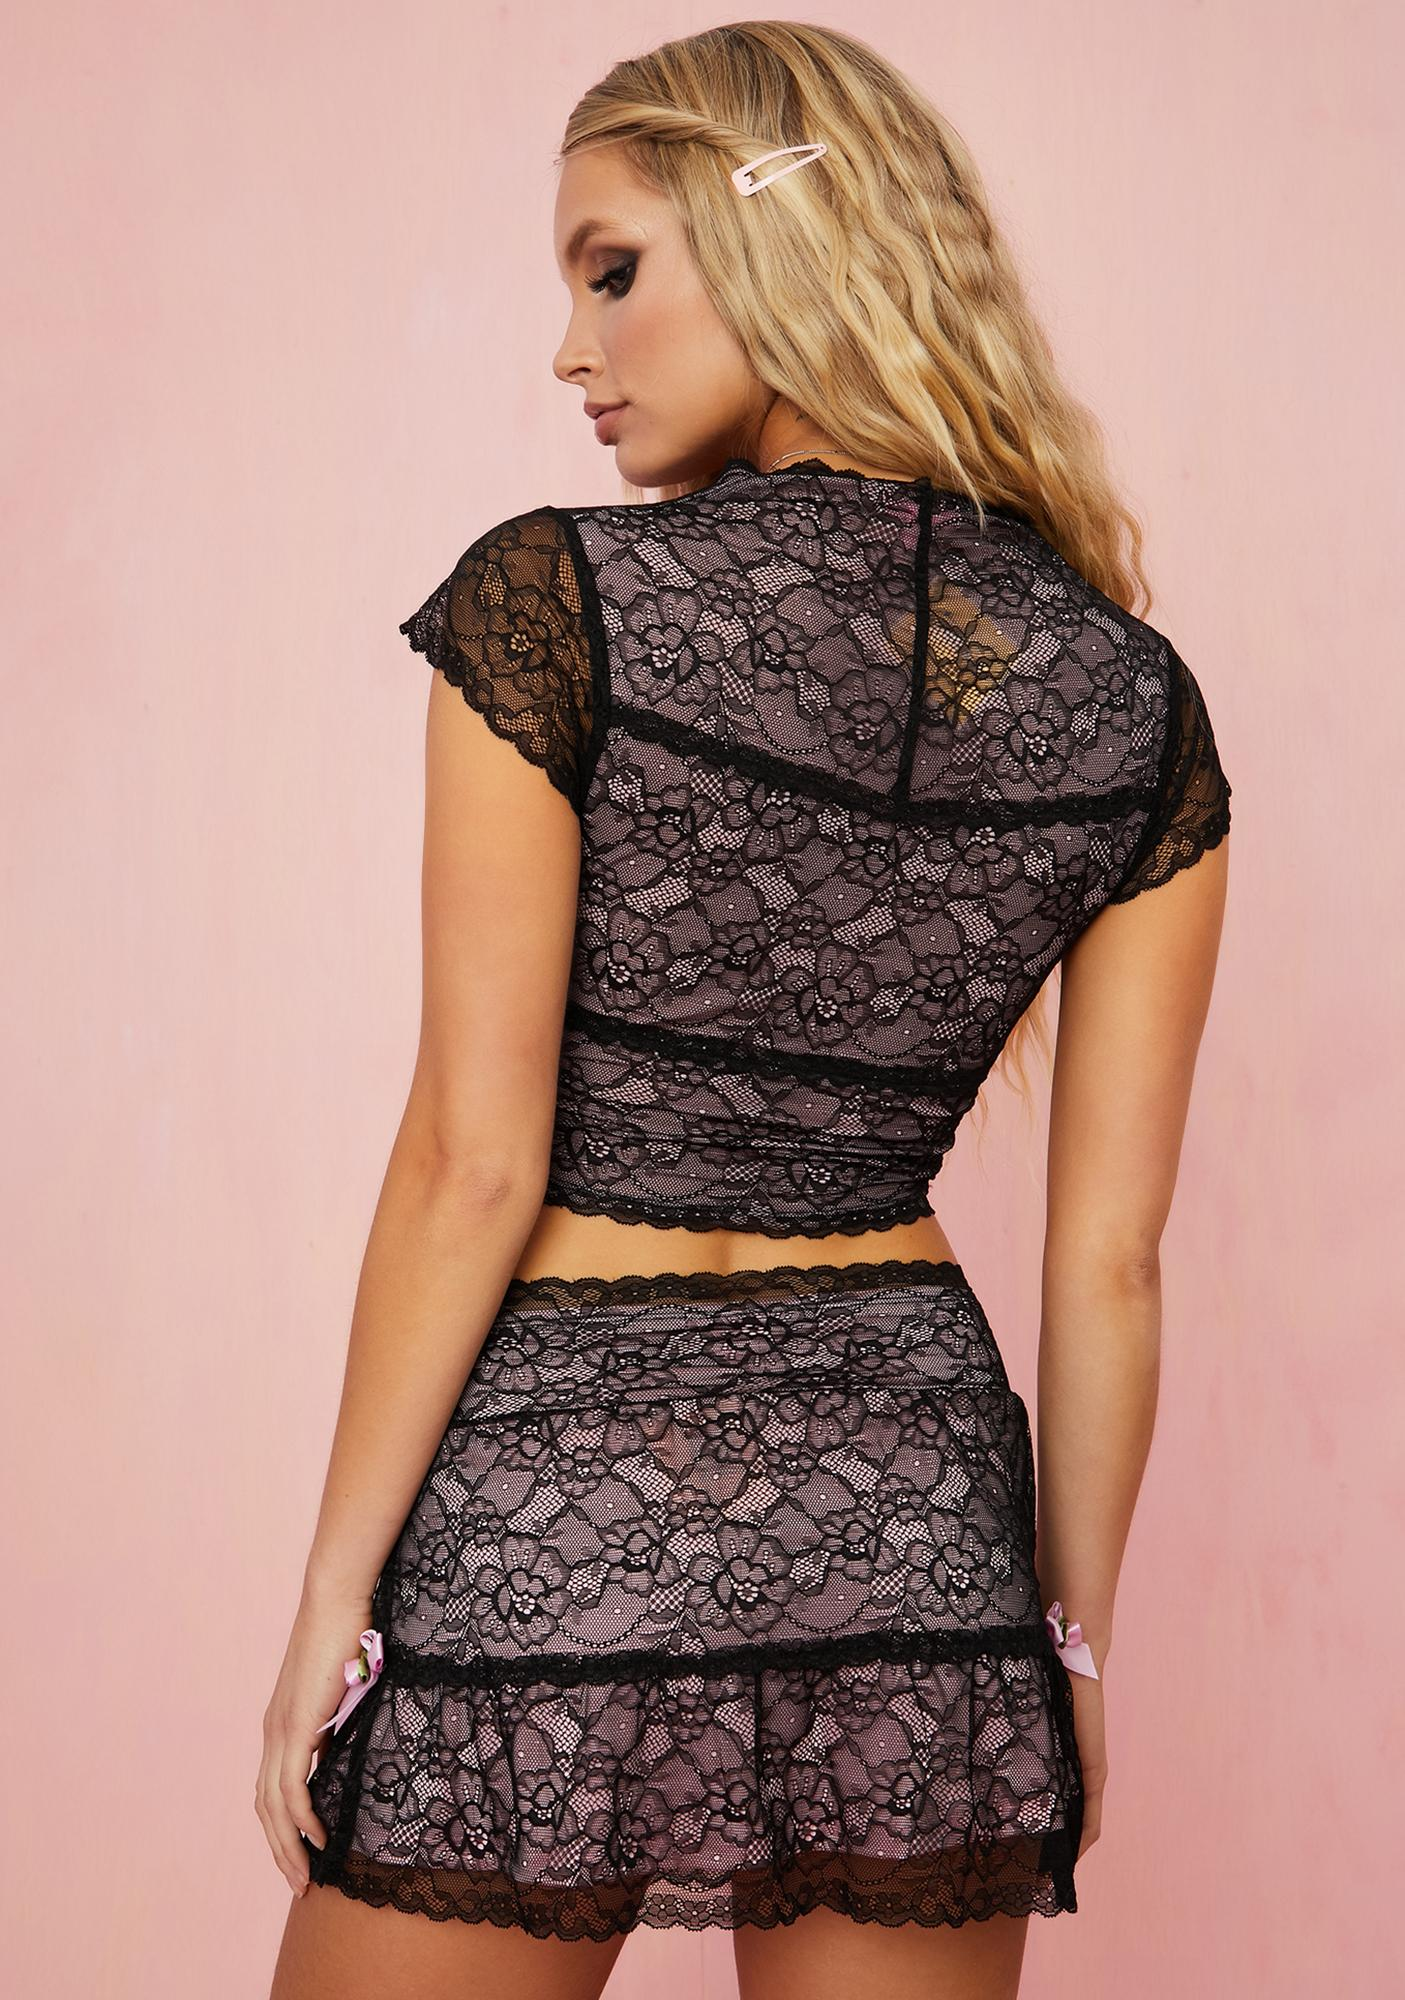 Sugar Thrillz Portrait Mode Lace Mini Skirt